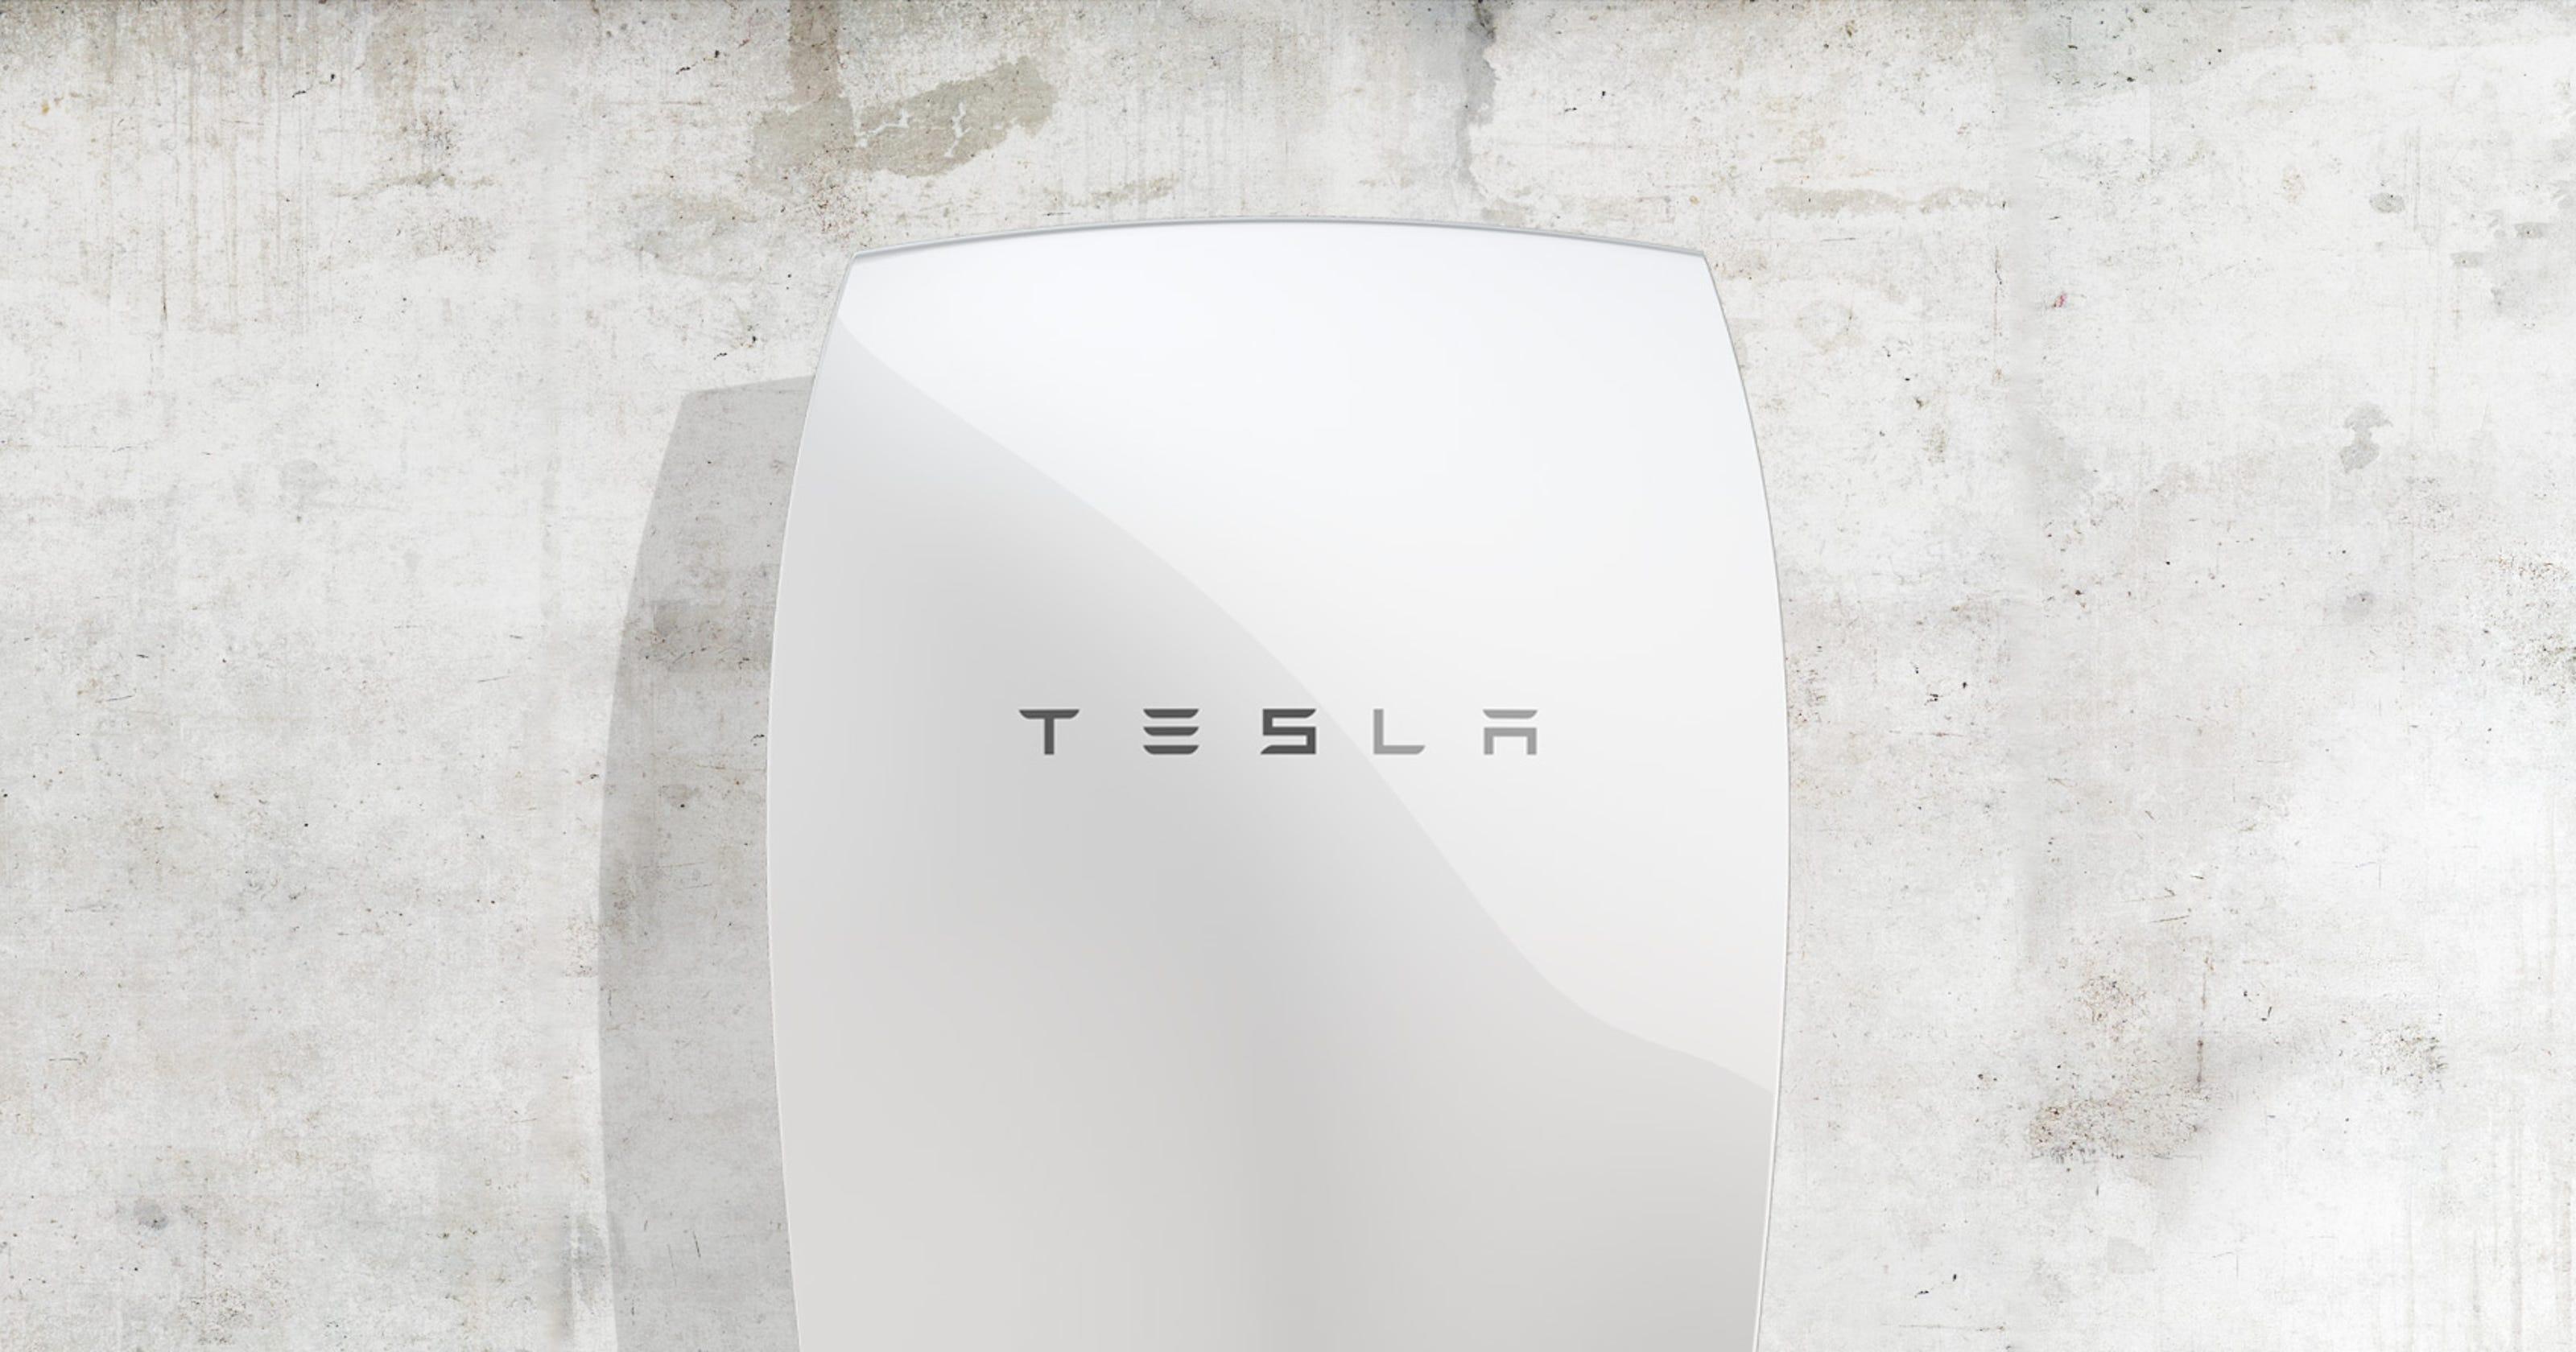 Tesla Home Battery >> Tesla Ceo Elon Musk Reveals Powerwall Home Battery